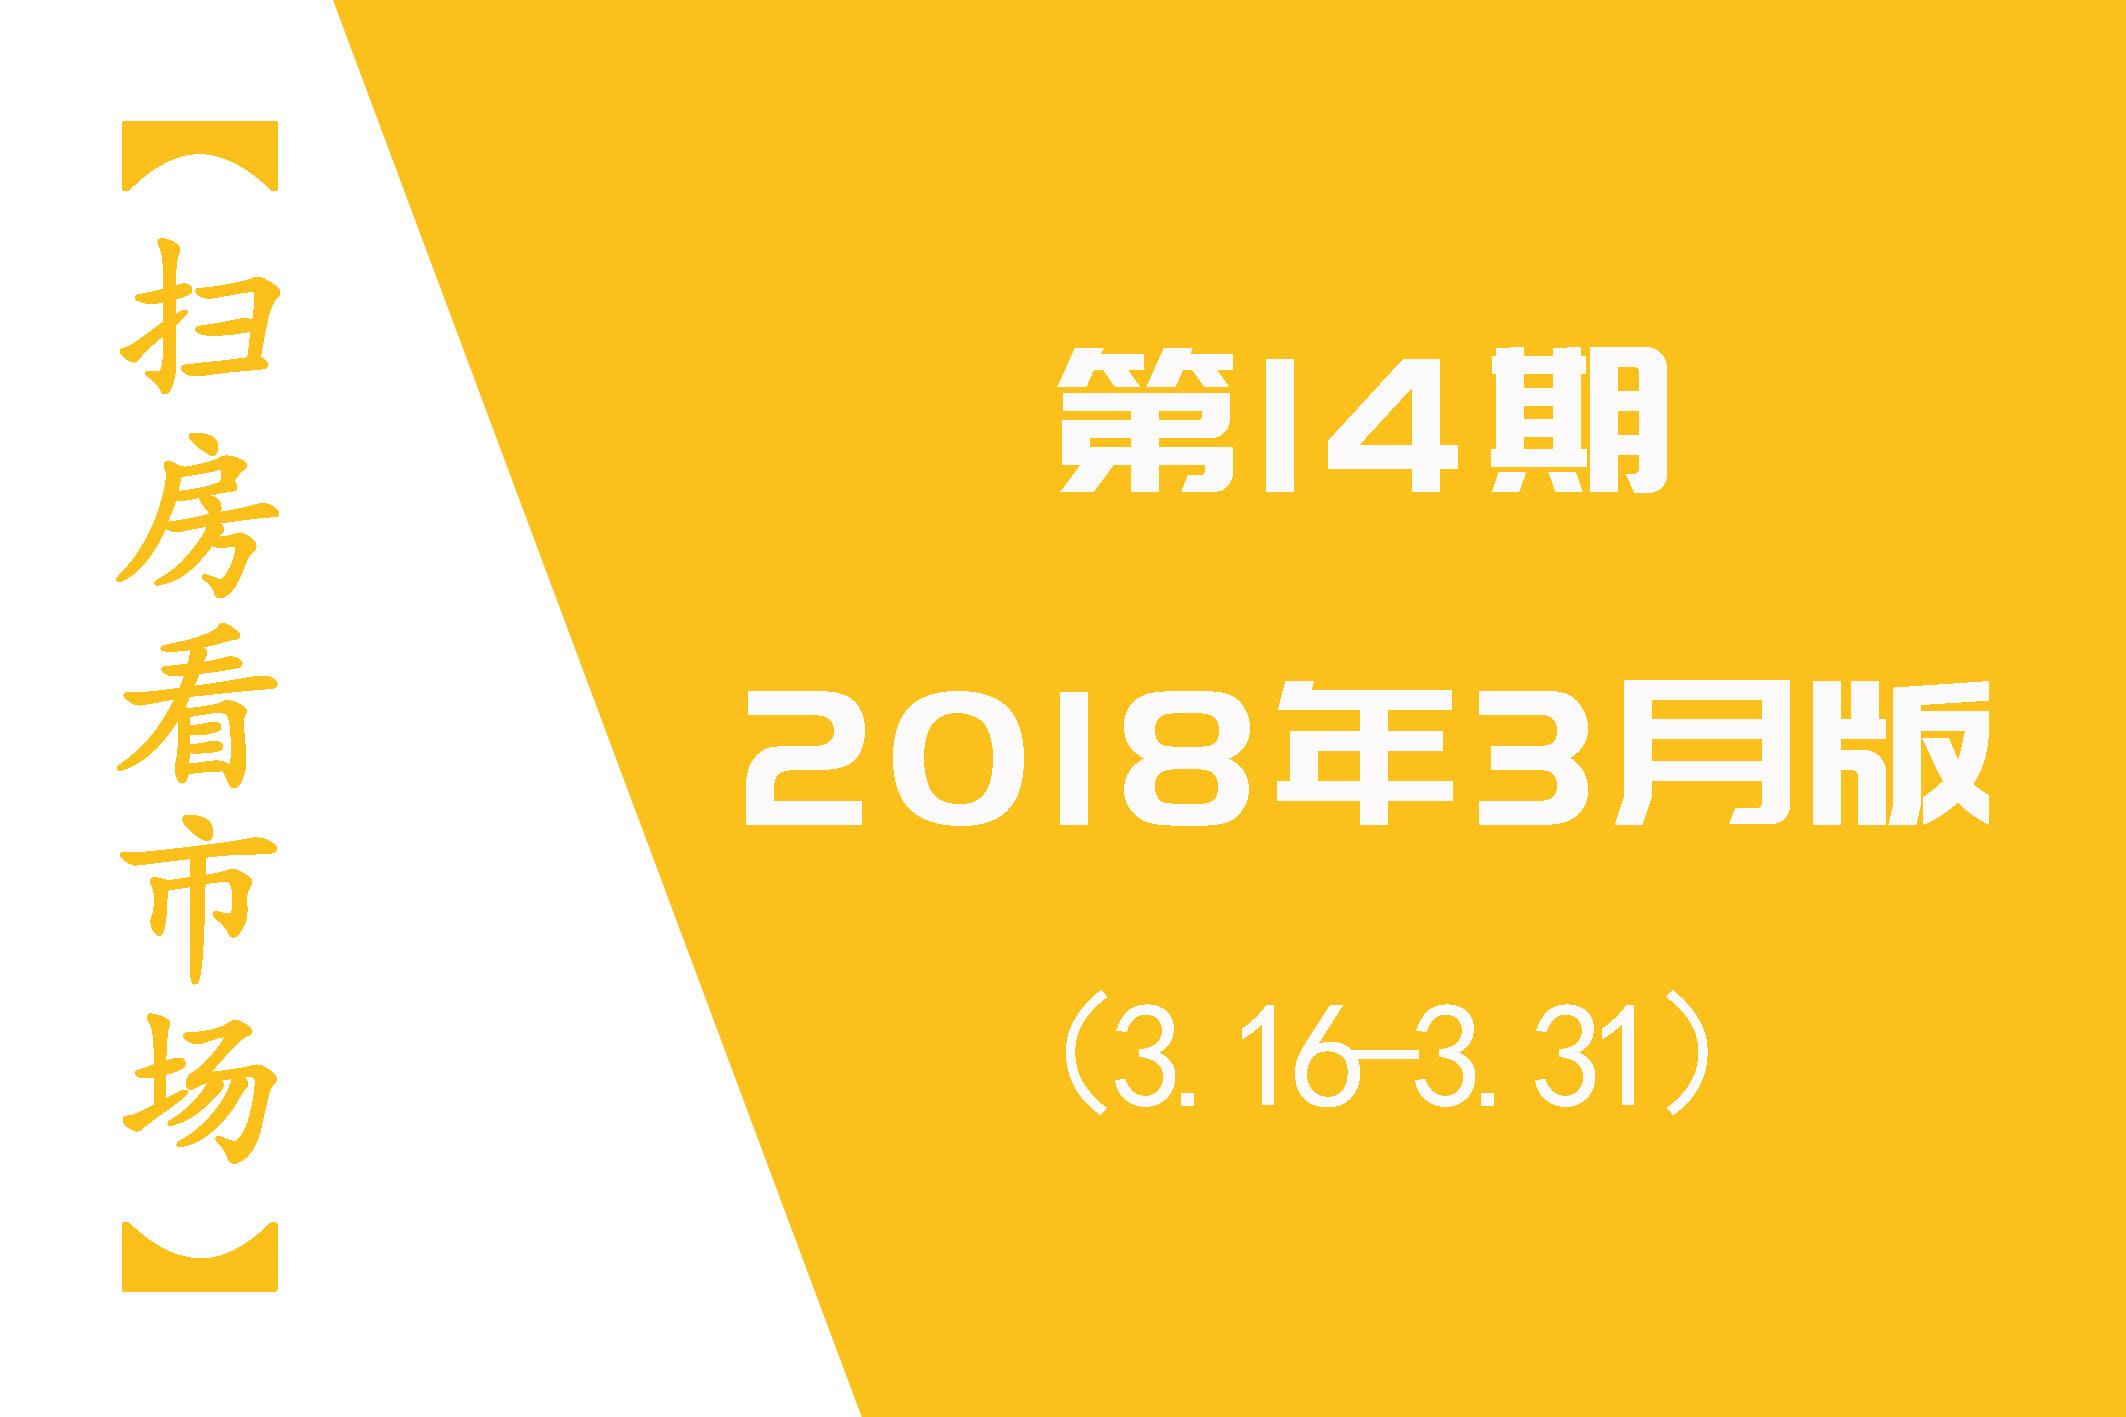 http://img.saofang.cn/new/distrib/areadelegate/12/marketing/20180404/20180404_gwJ0kP2Ana.jpg_news